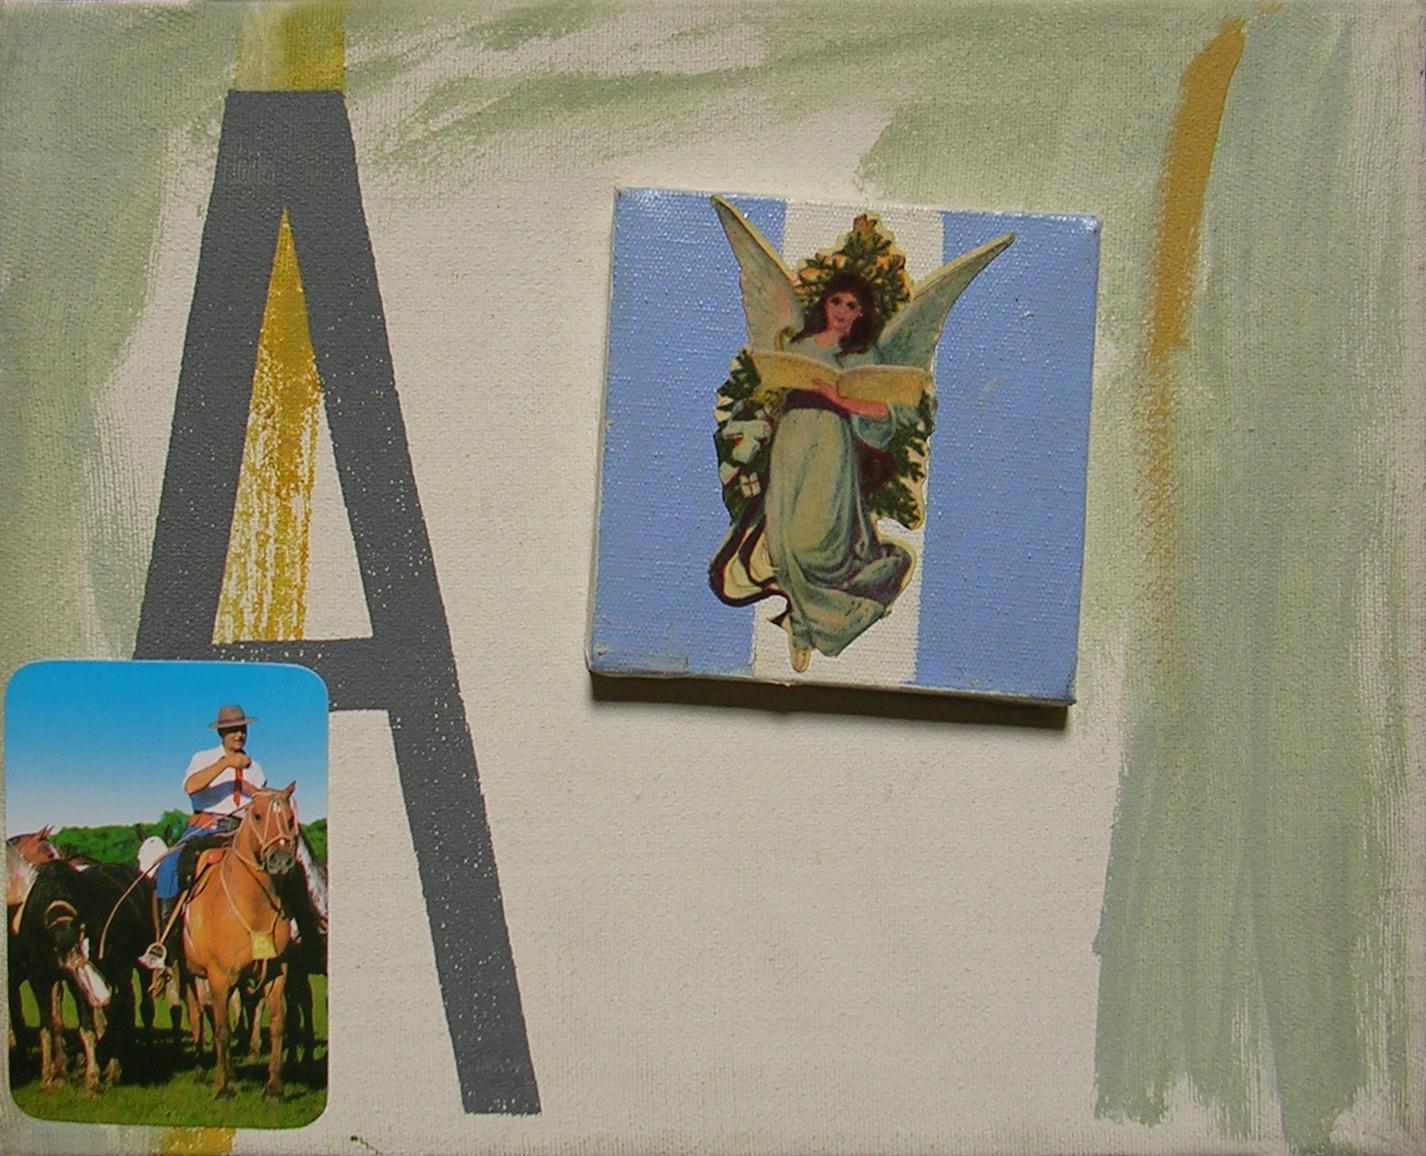 Abecedario A; objetos ensamblados, tela, papel sobre bastidor, 30 cm x 40 cm, 2007